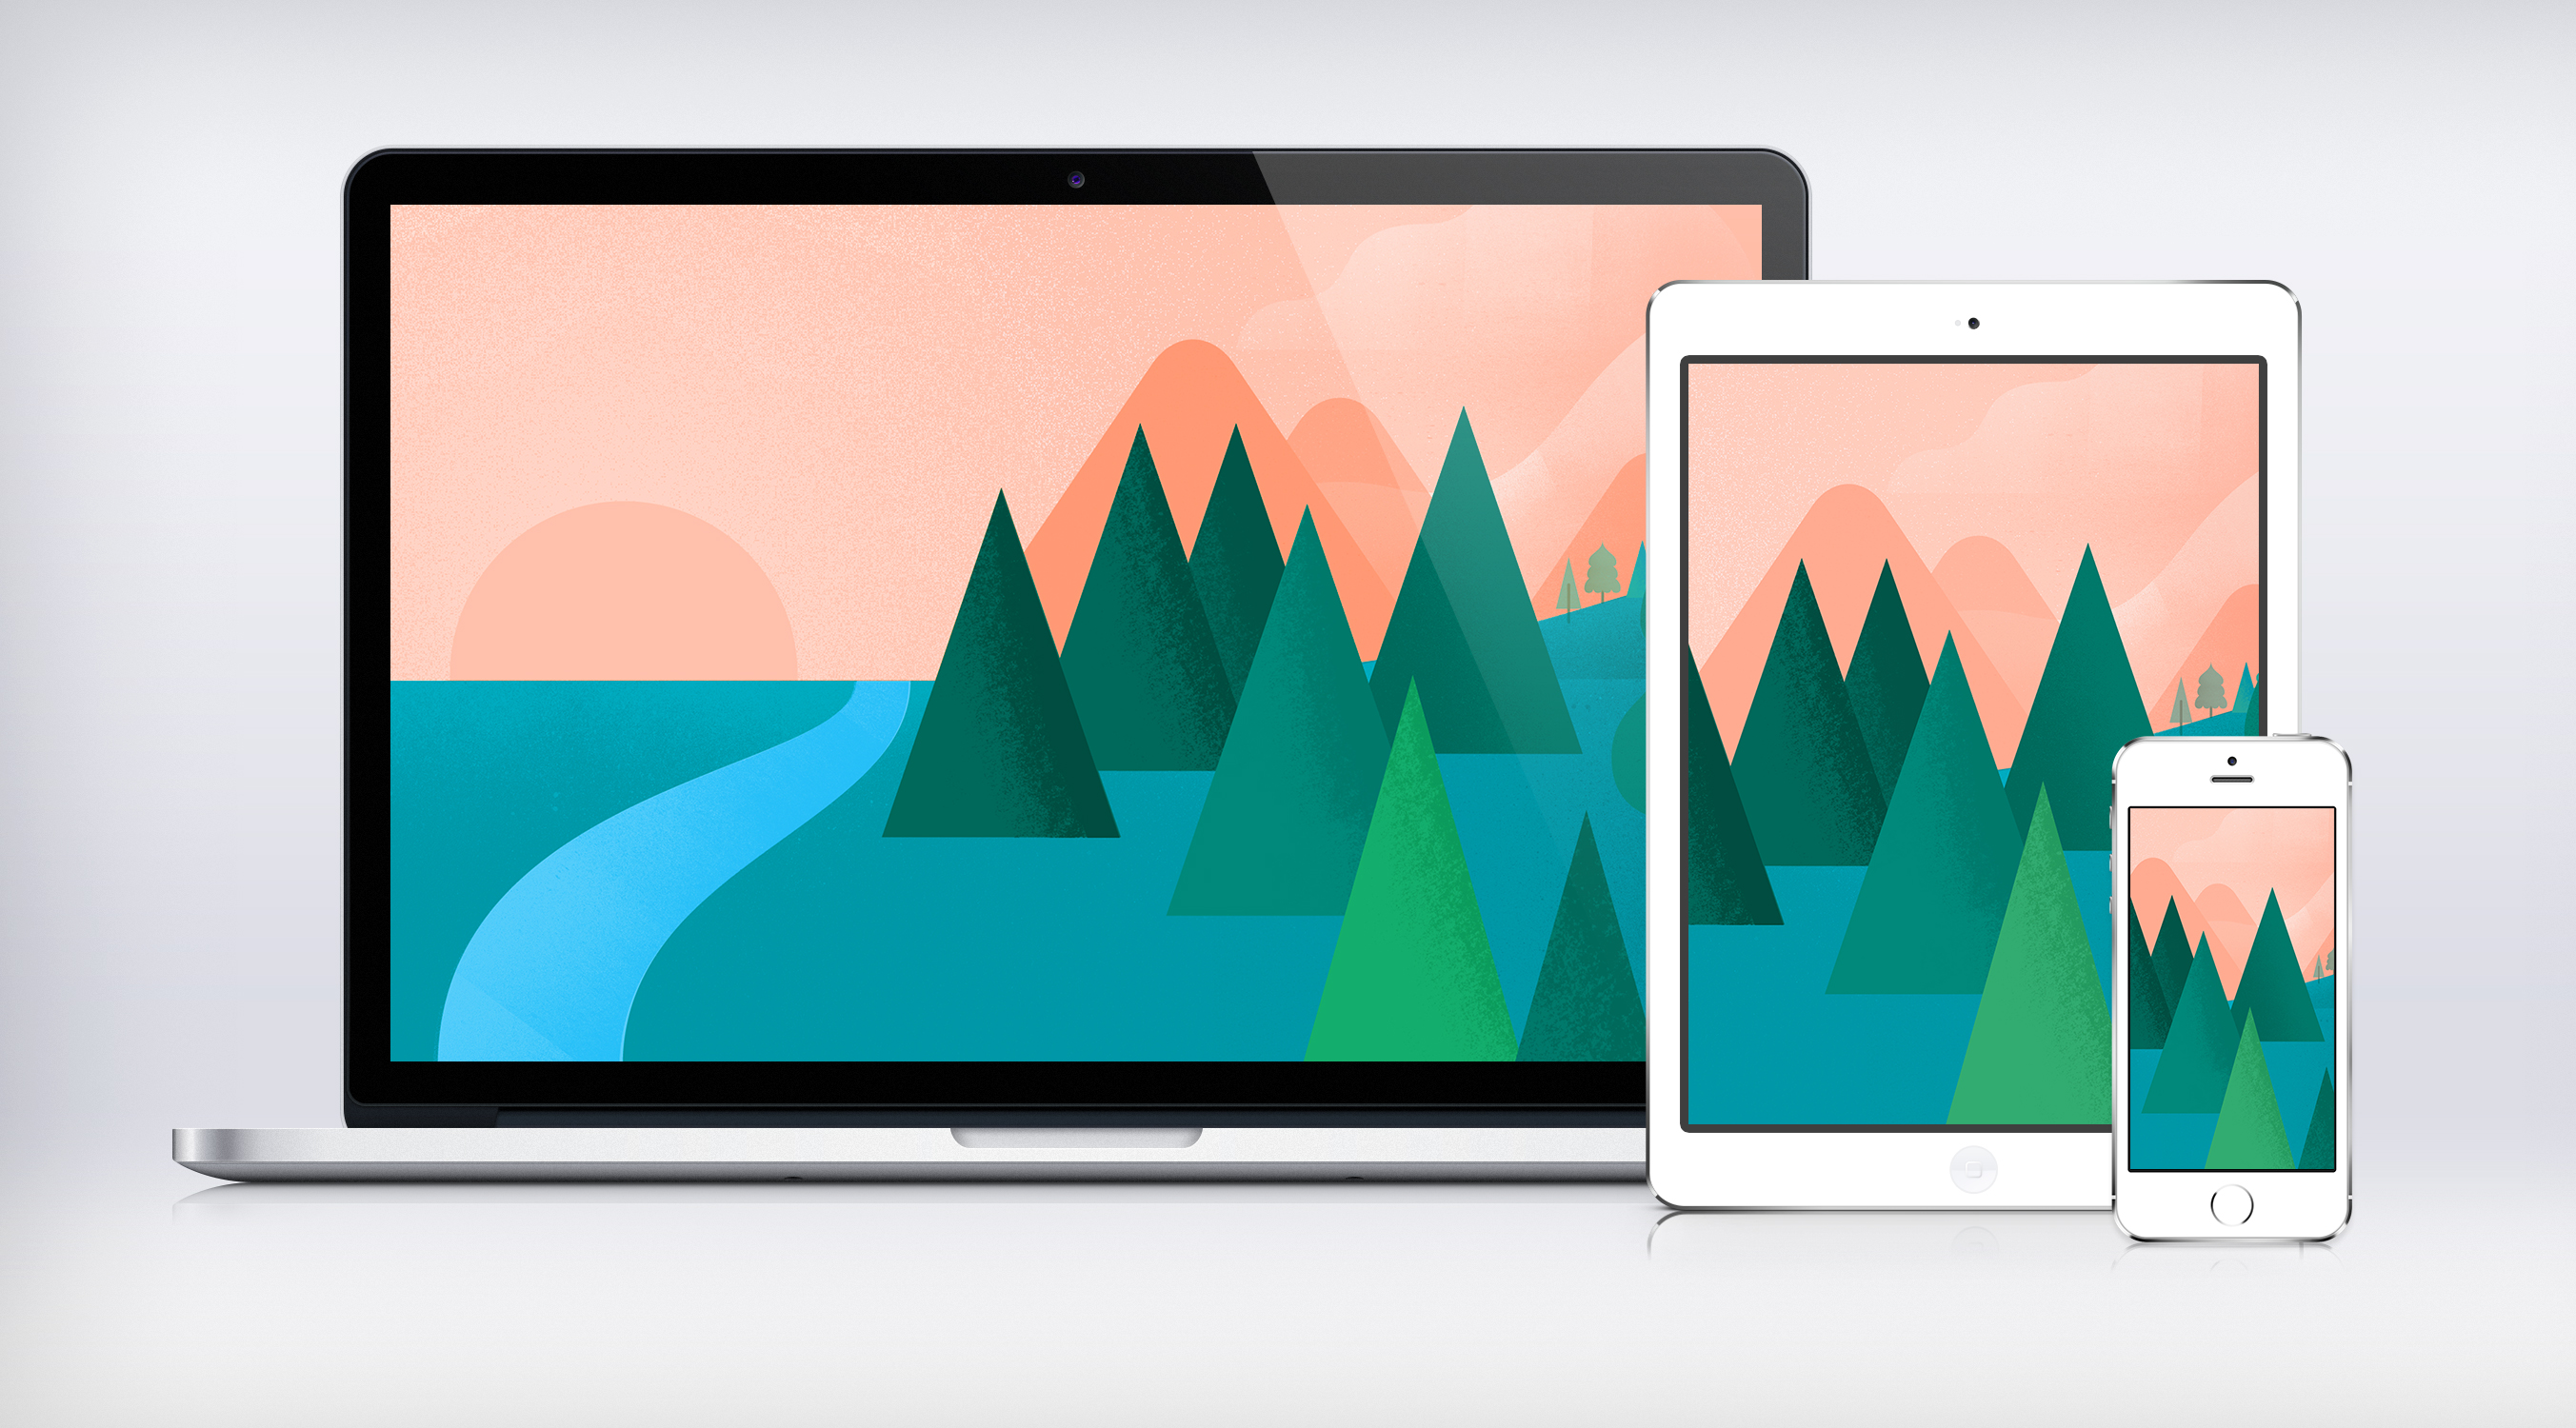 Google I/O Landscape Wallpaper Material Design